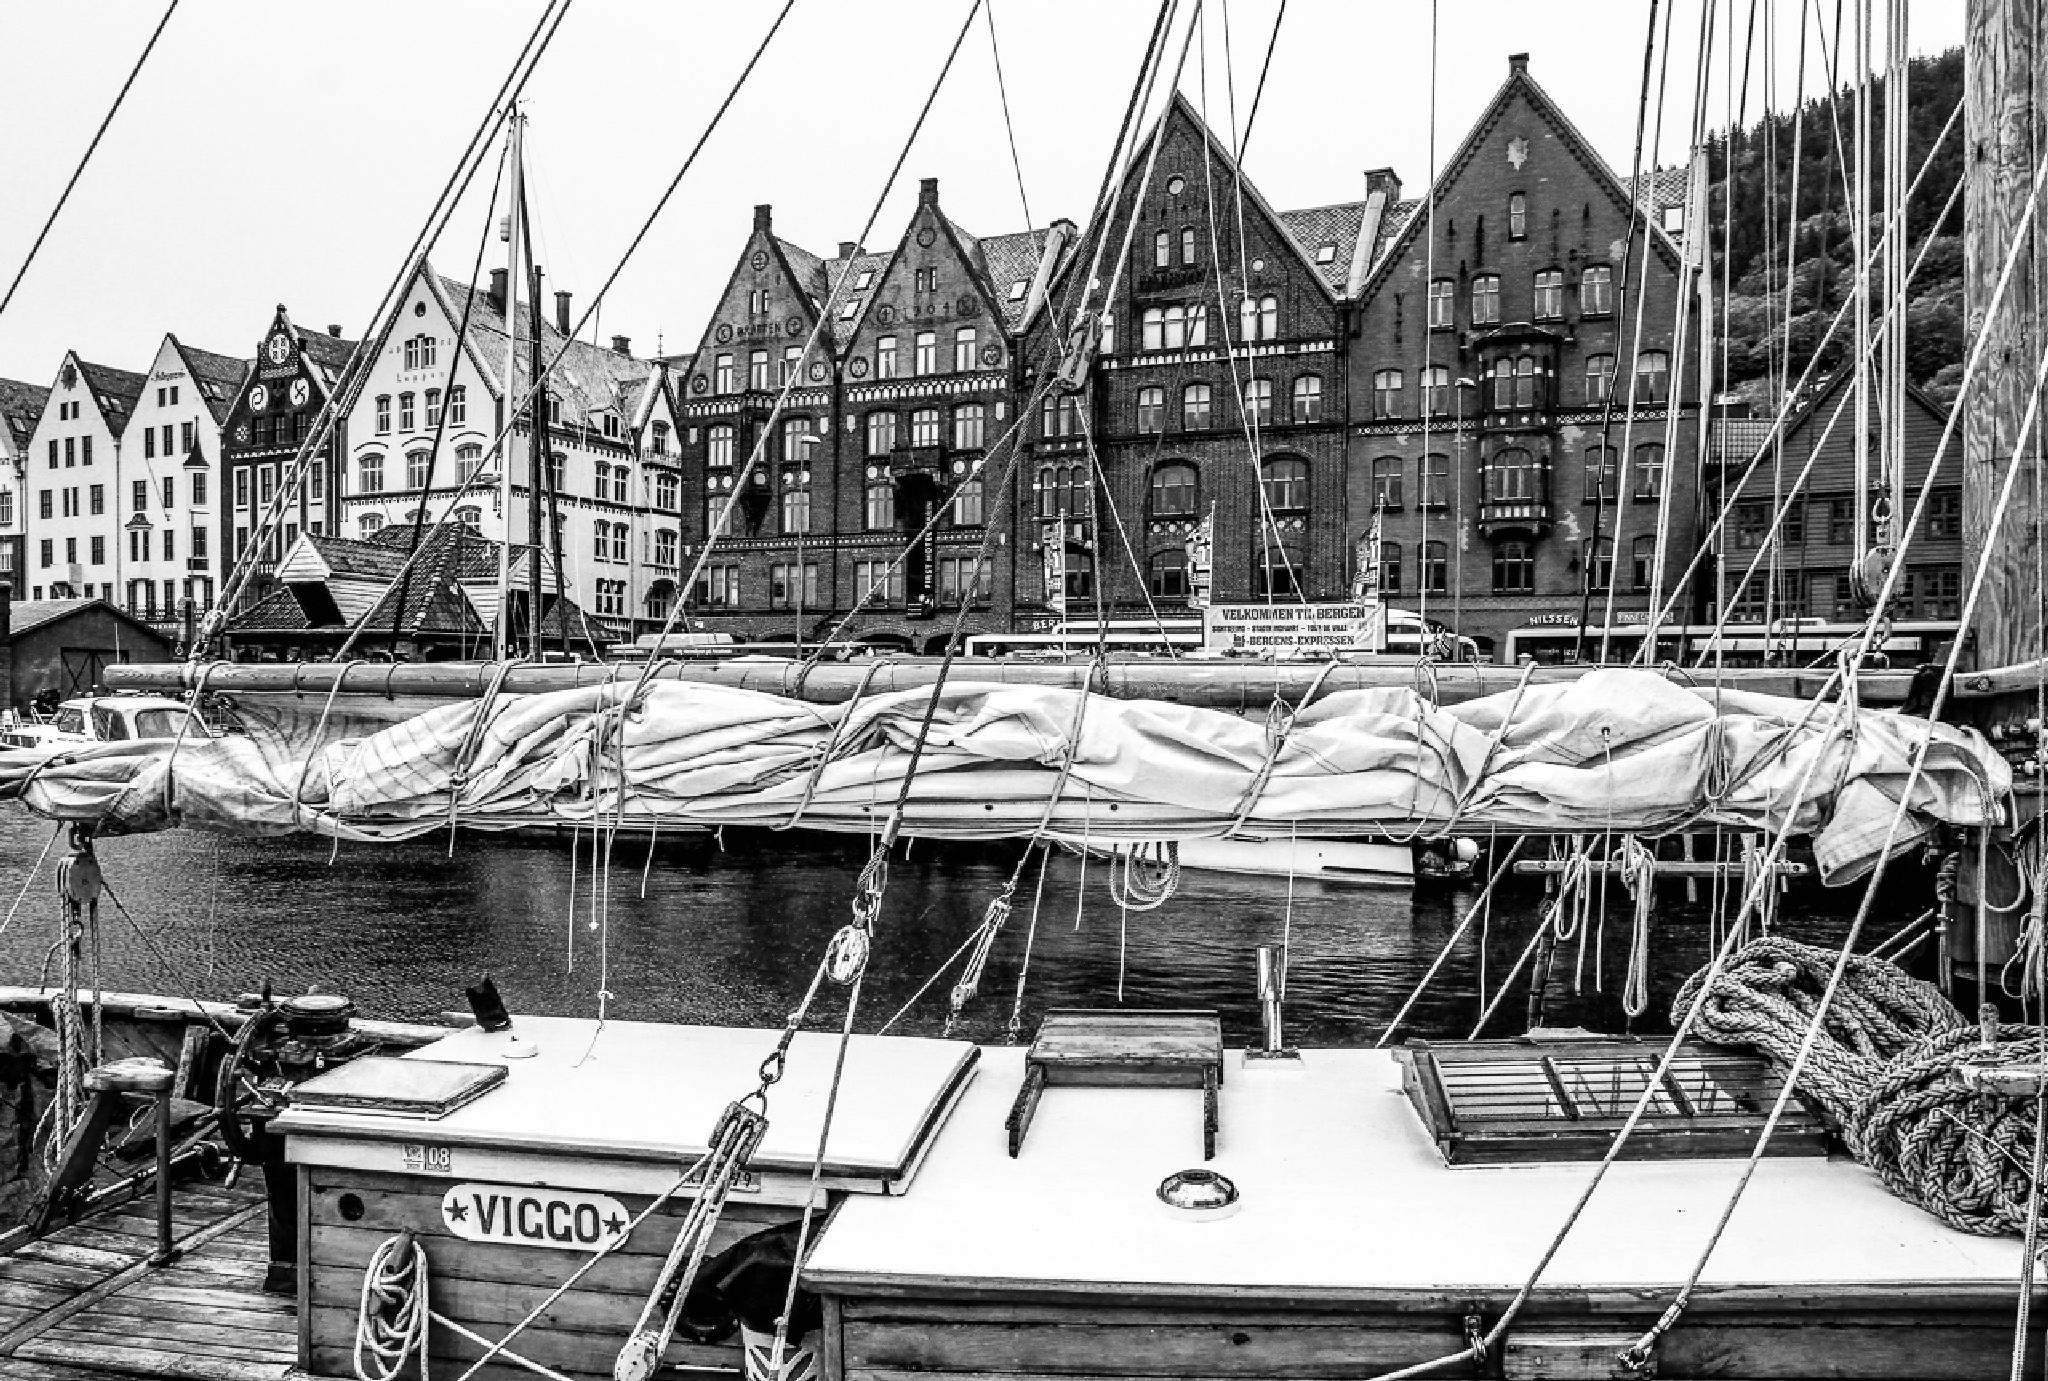 Bergen, Norway by FSFoto